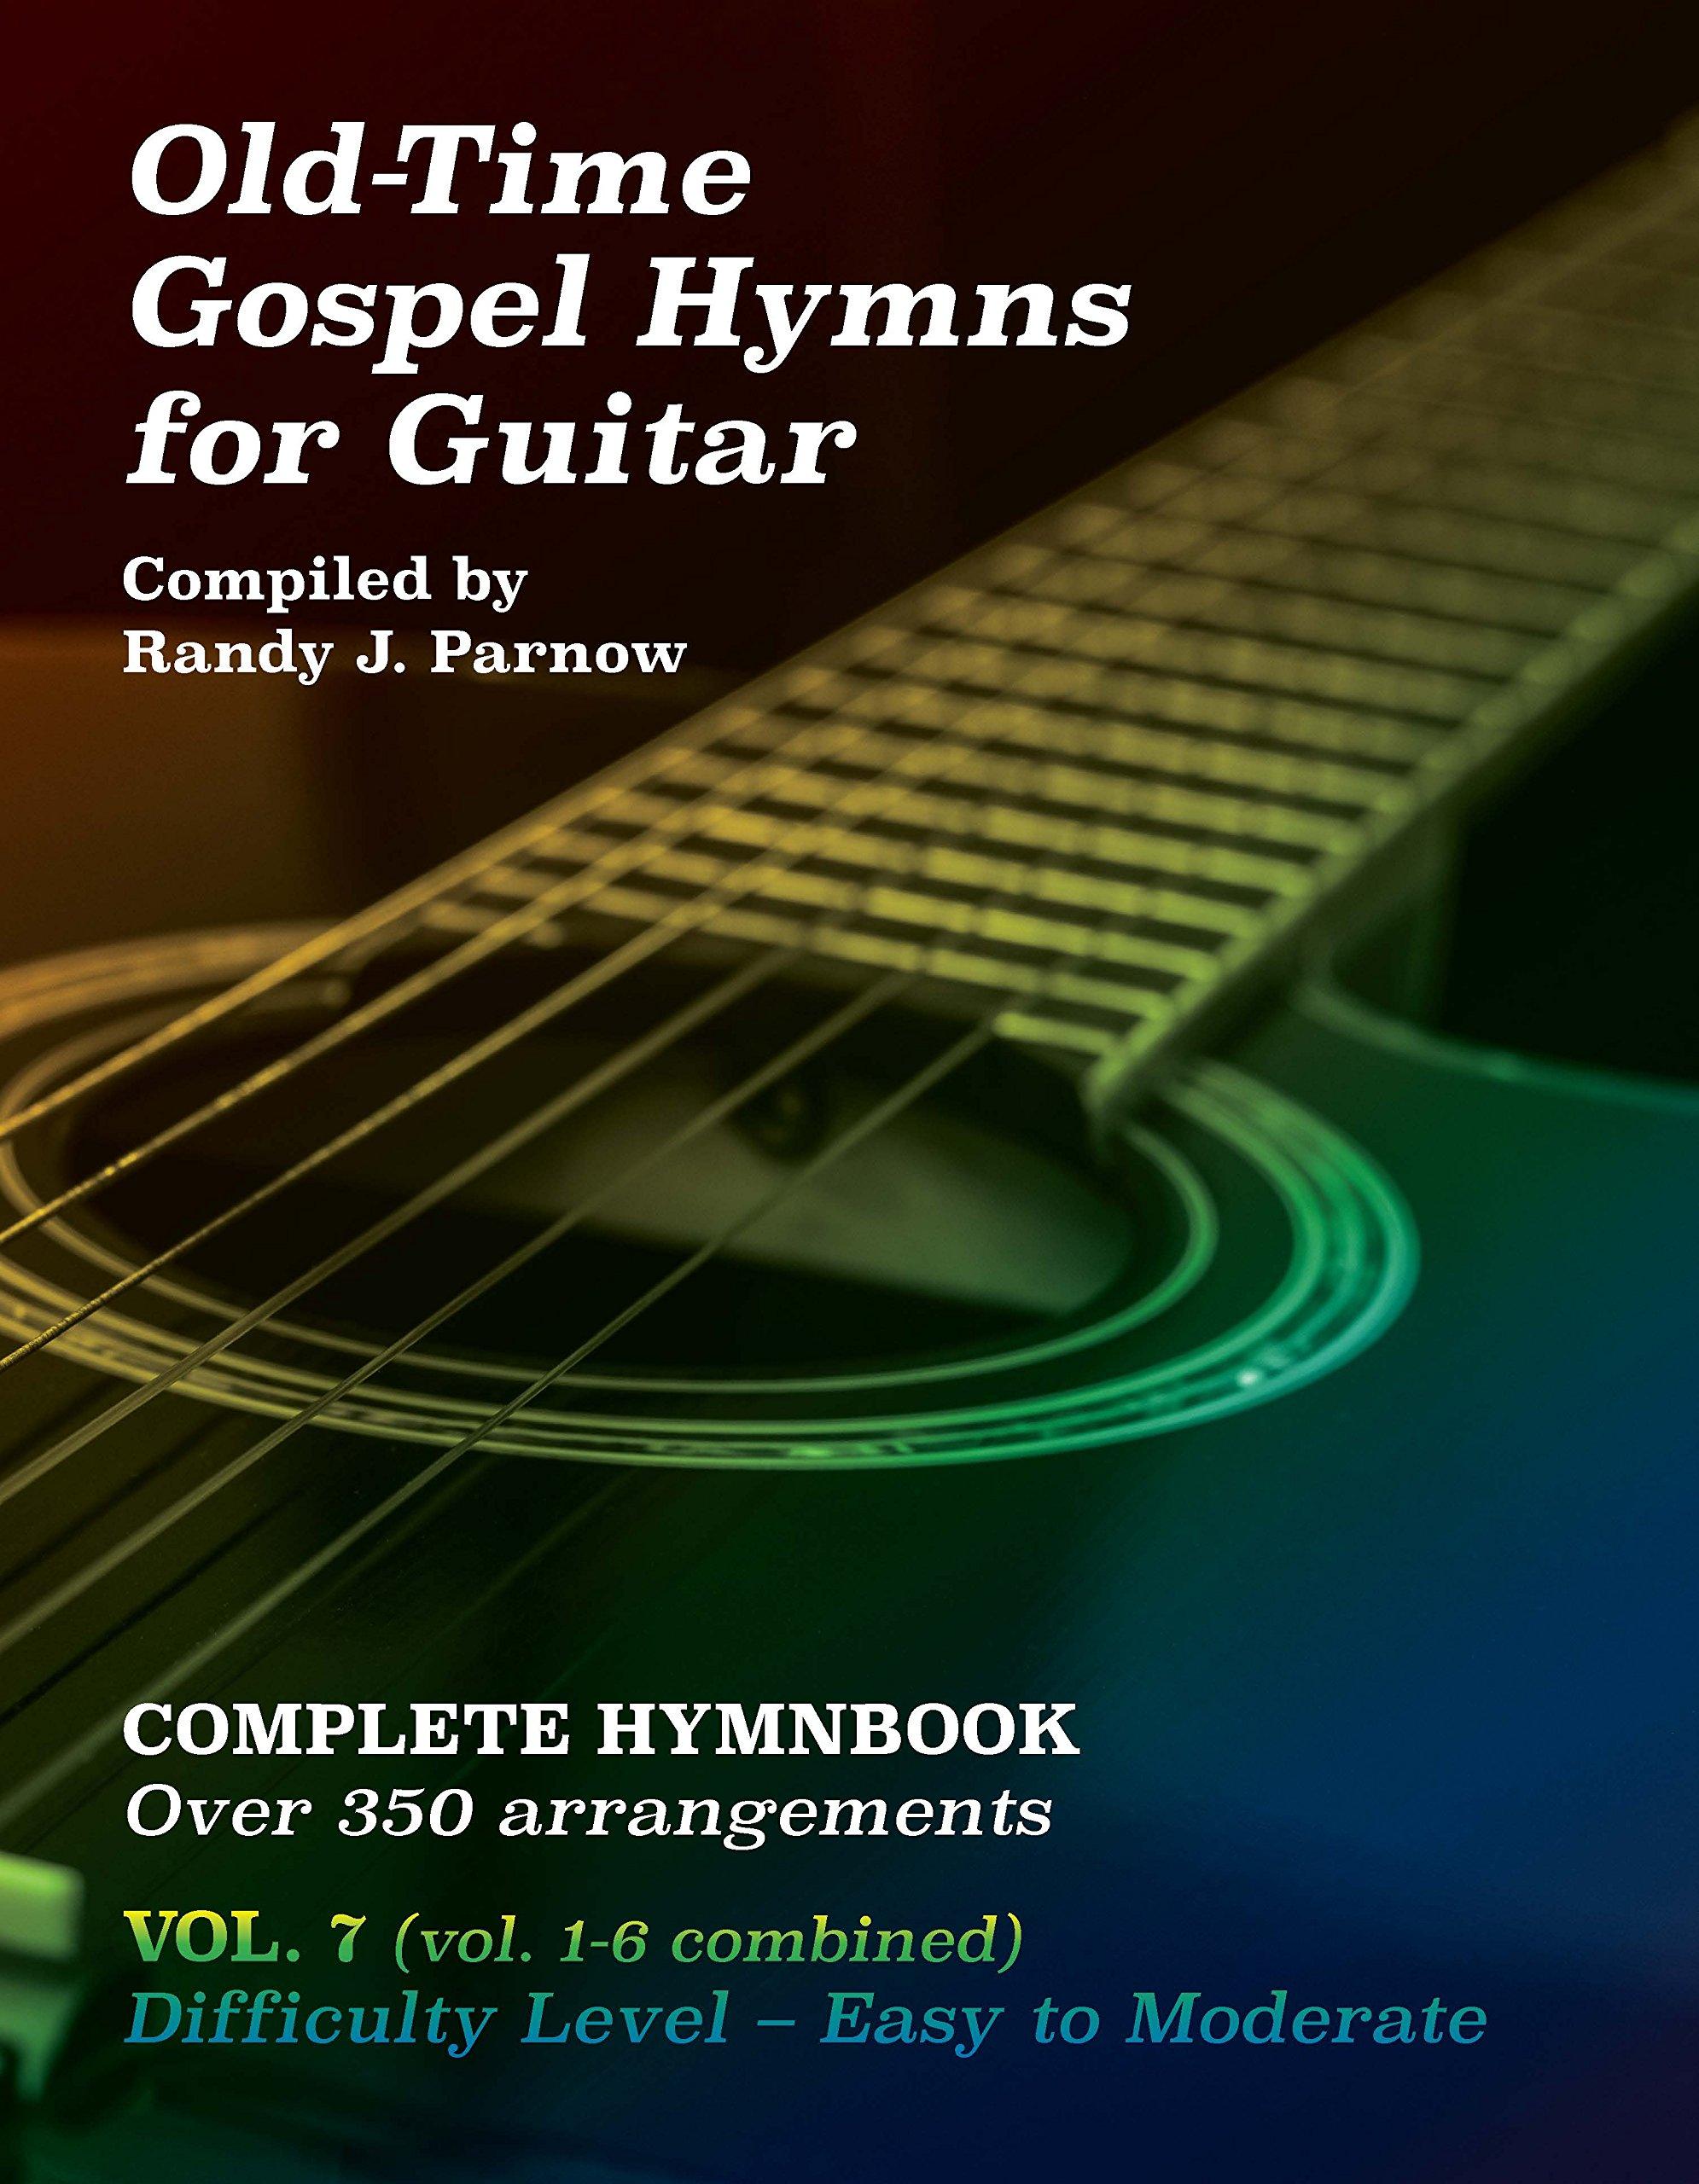 Read Online Volume #7 - Old-Time Gospel Hymns for Guitar (Vol 1-6 Combined) pdf epub